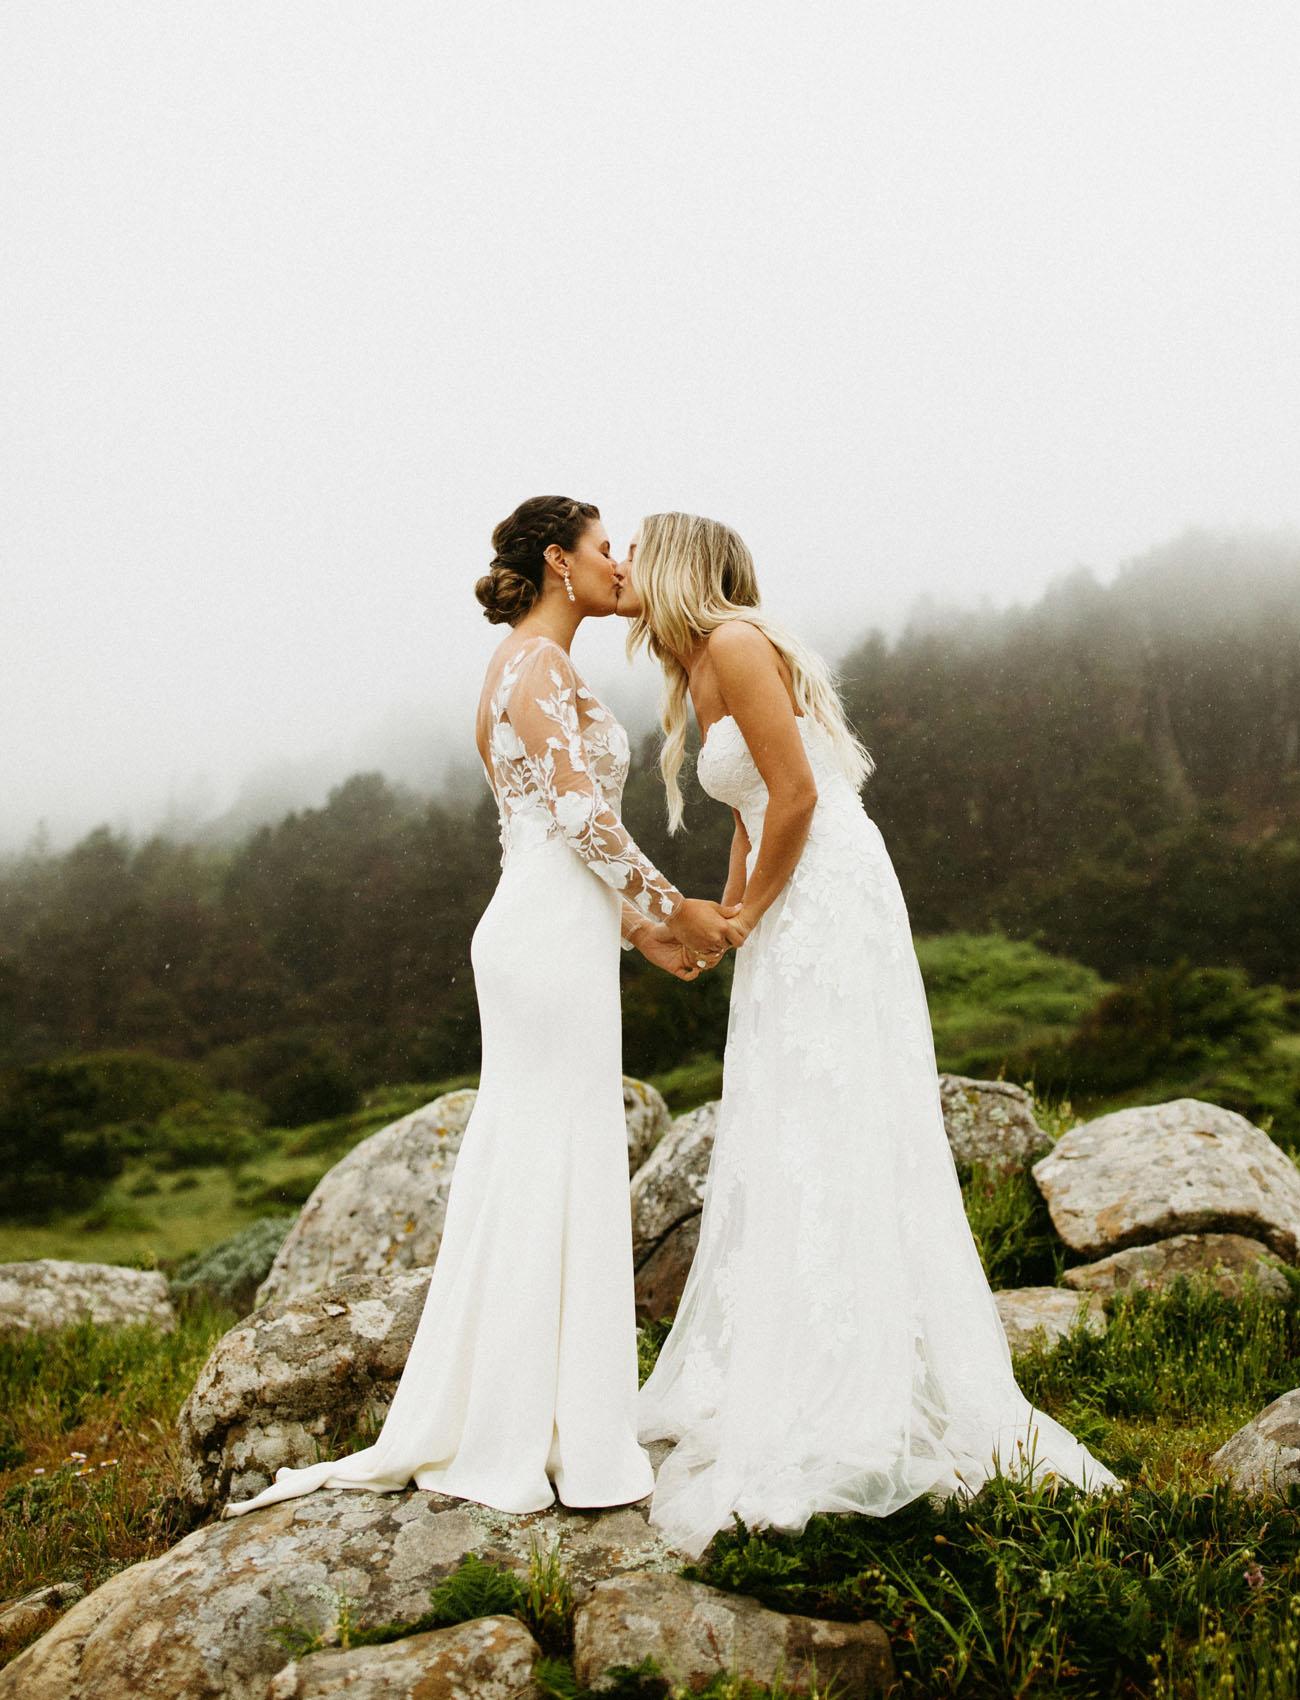 Woodsy Wedding Dresses from BHLDN